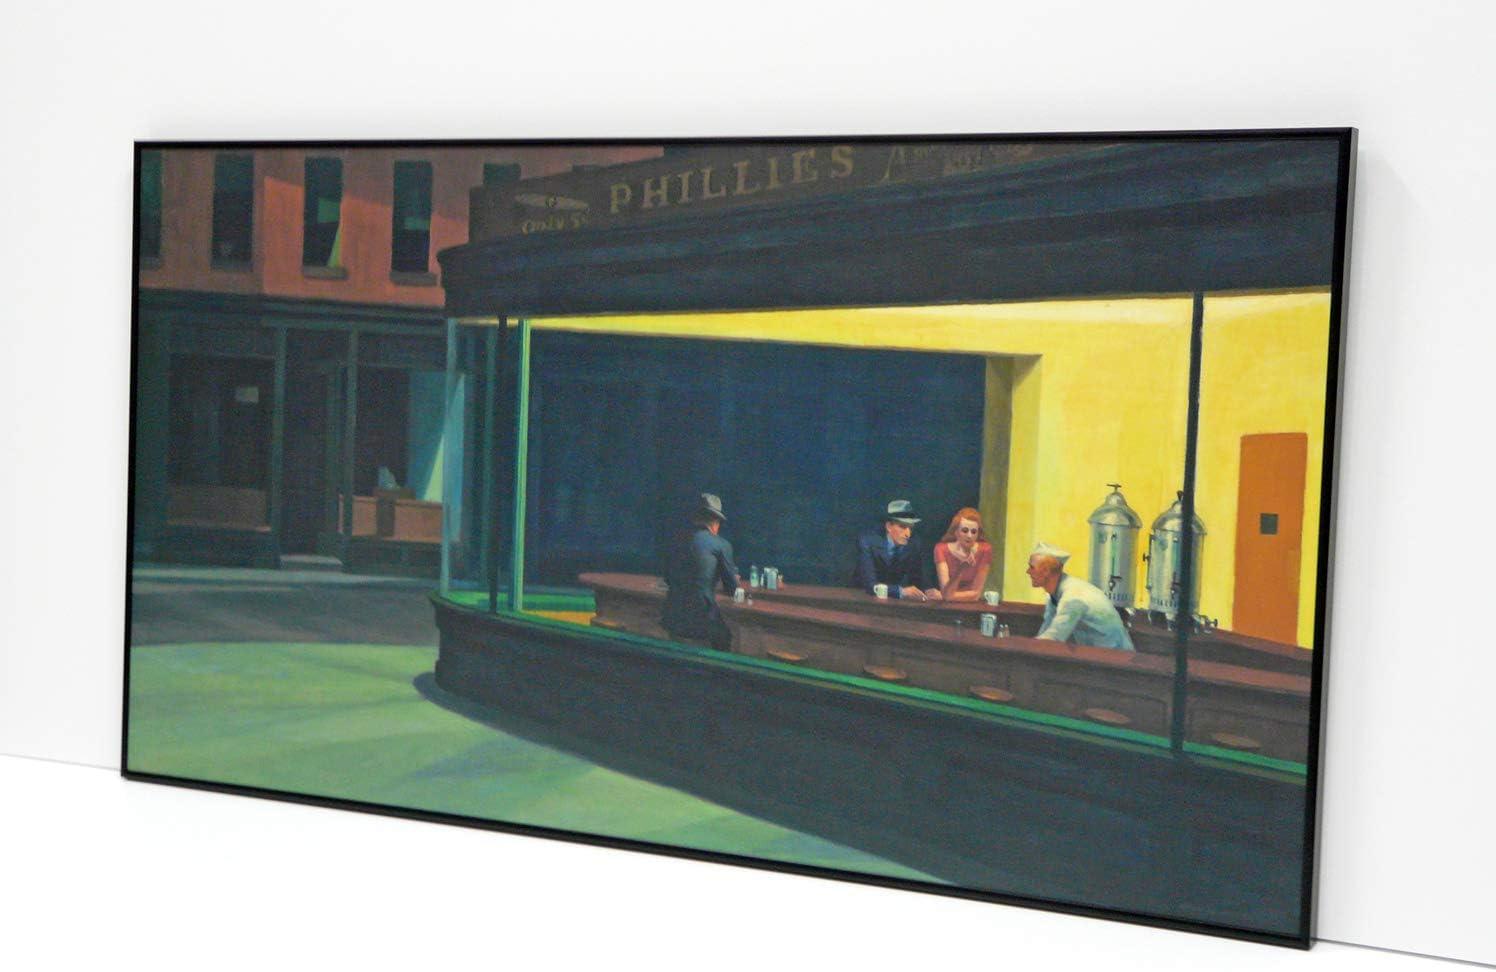 BaikalGallery Nighthawks, Edward Hopper 1942, Cuadro Enmarcado (P2678)- Moldura Aluminio Negro Mate - Montaje en Panel Adhesivo y Rígido de 1cm (Foam)- Laminado Acabado Mate (Sin Cristal) (60x120cm)